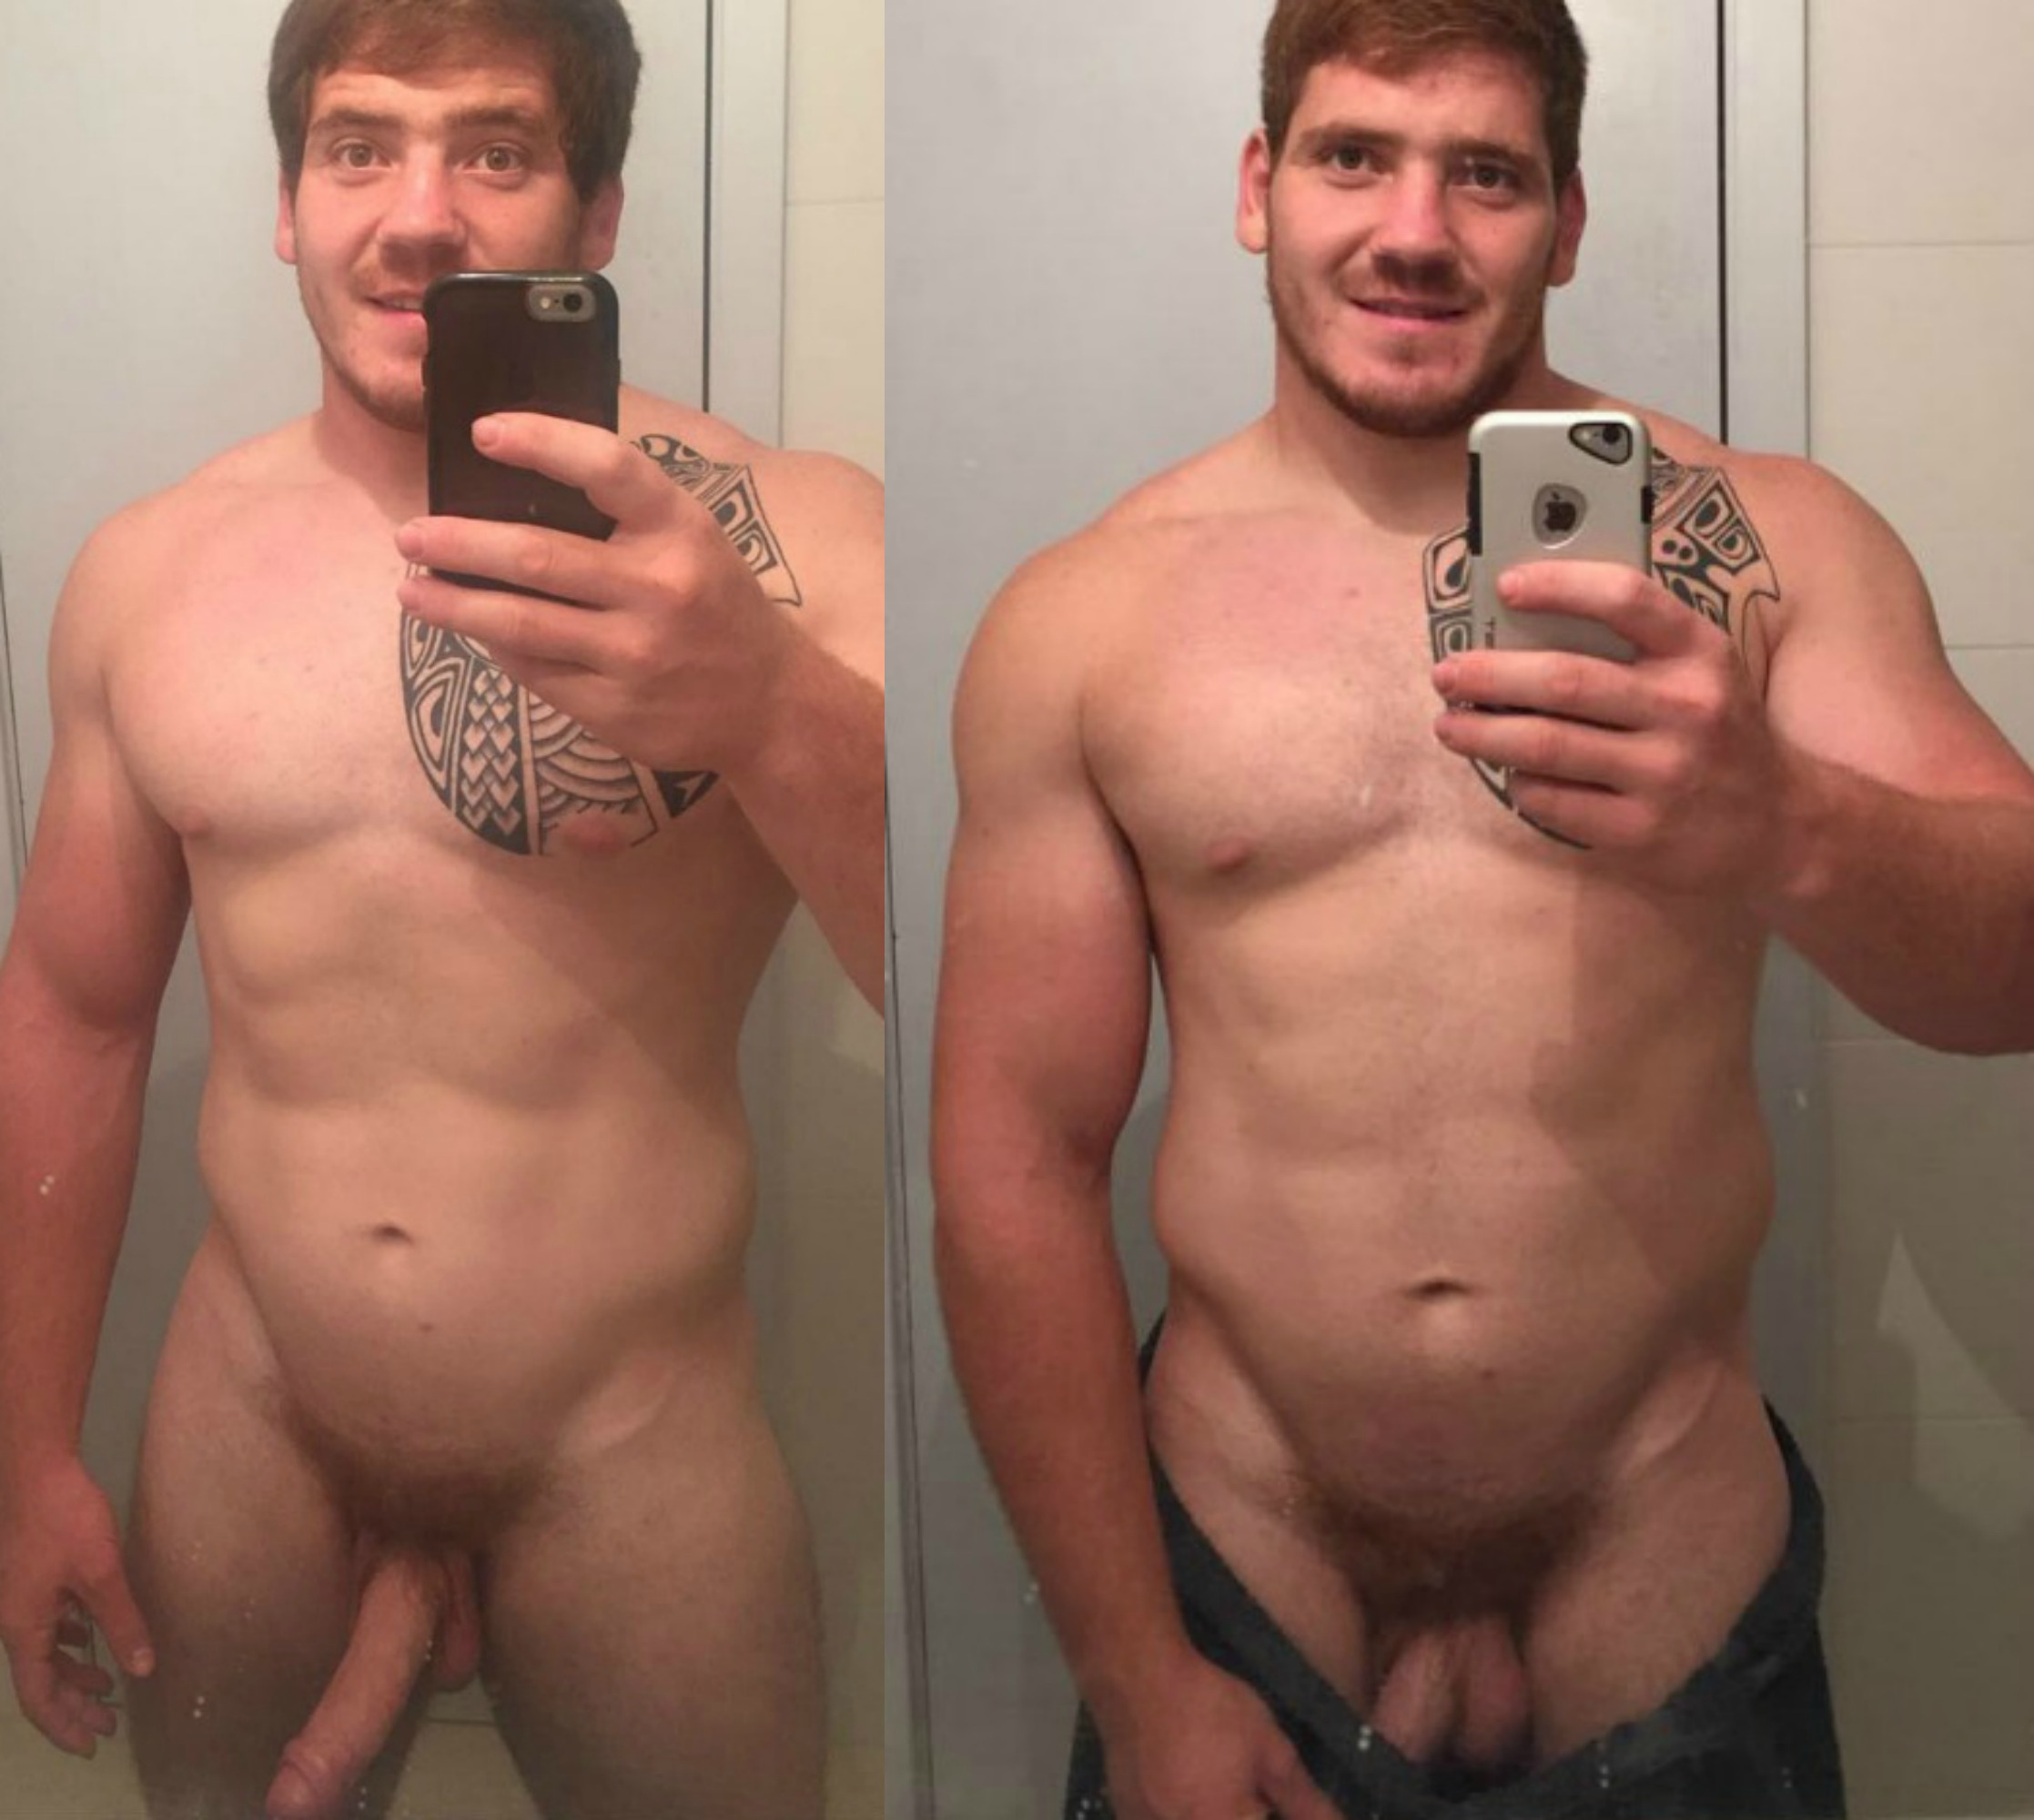 Adam brody dating 2014 10